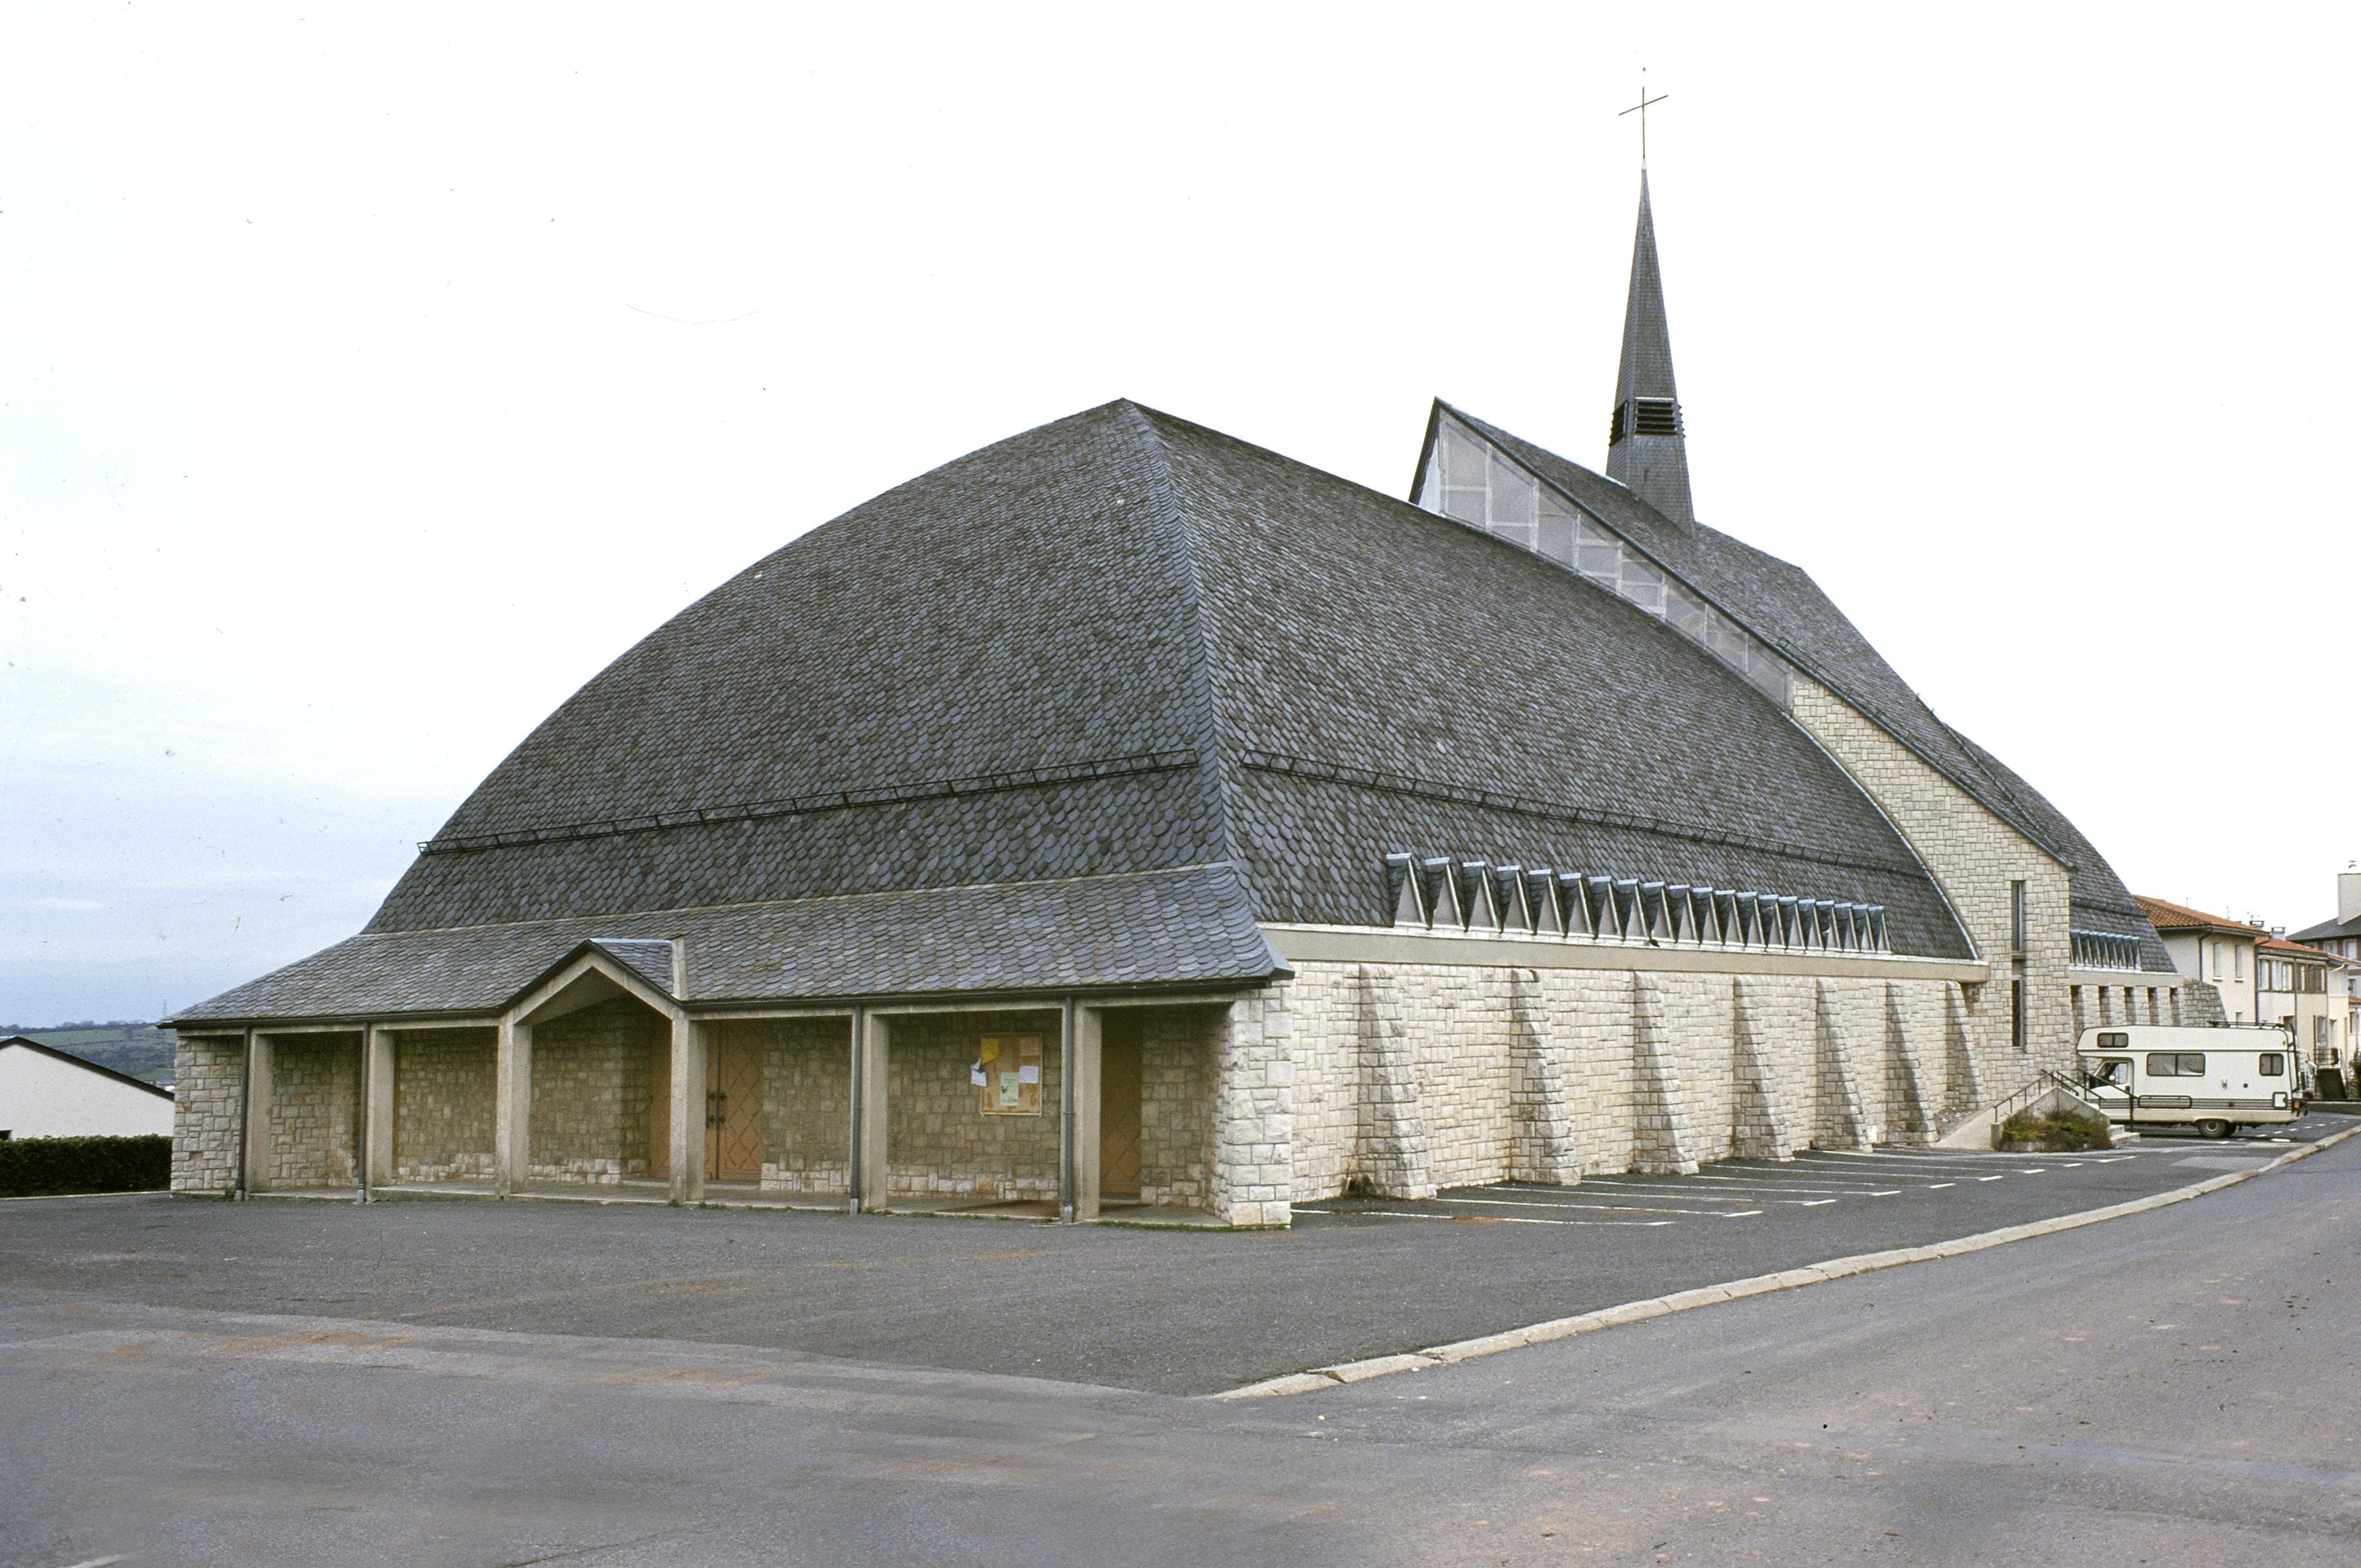 Eglise Saint-Joseph l'Artisan